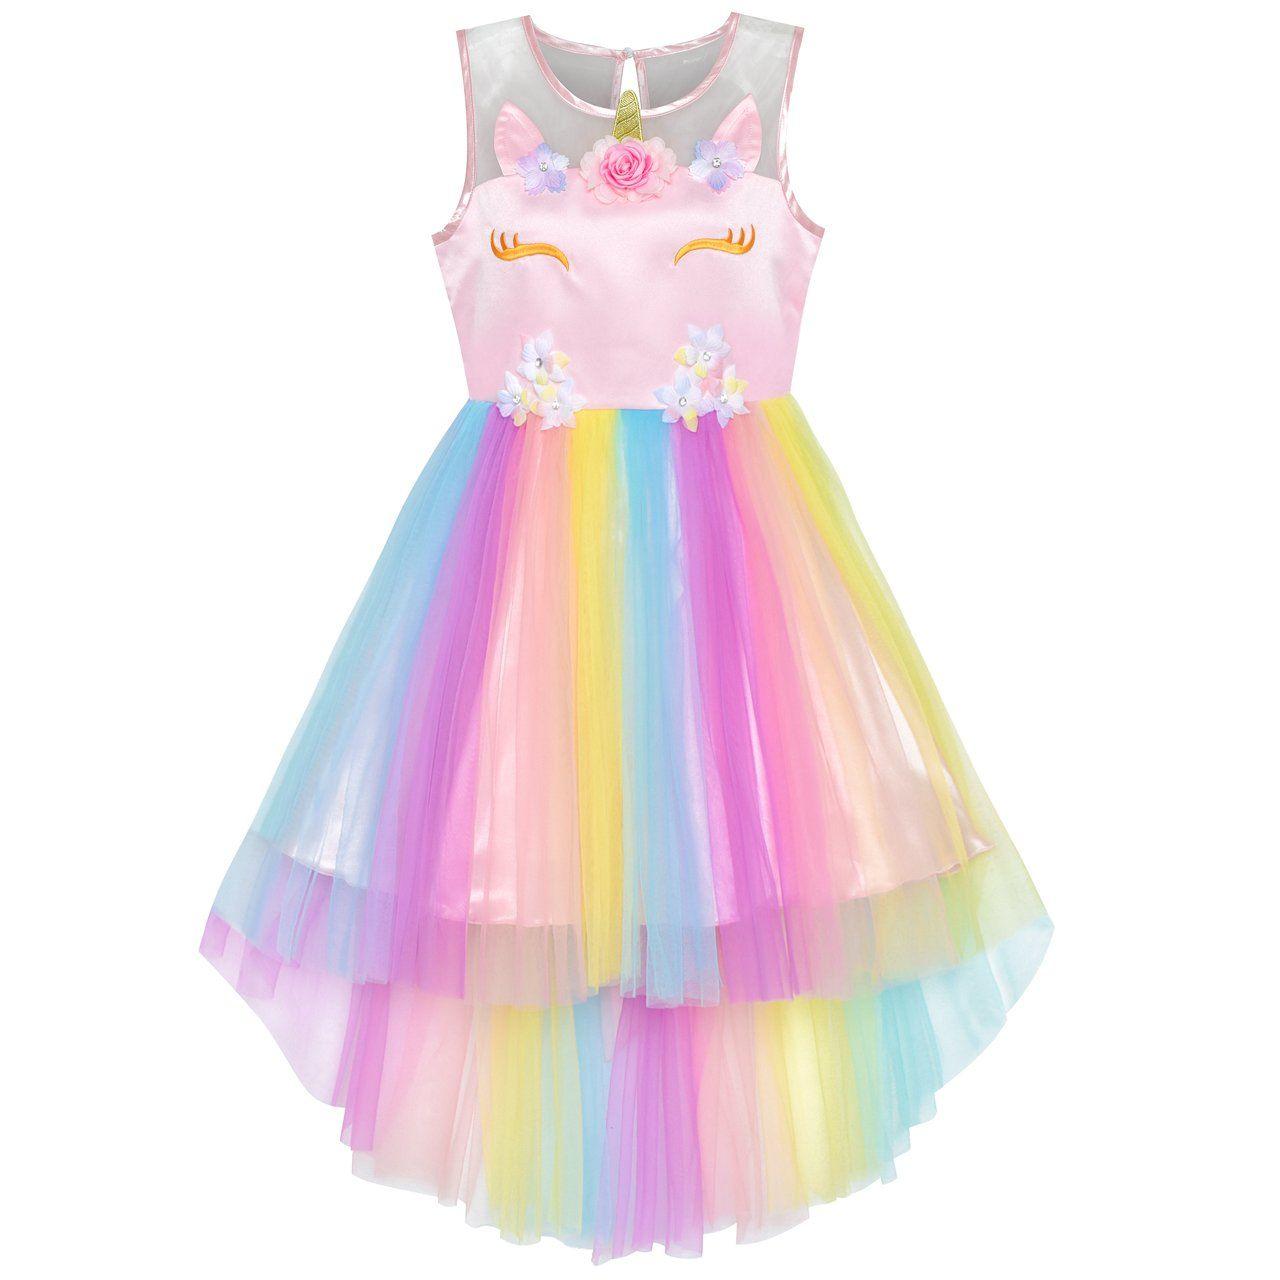 Flower Girls Dress Unicorn Rainbow Halloween Costume Party